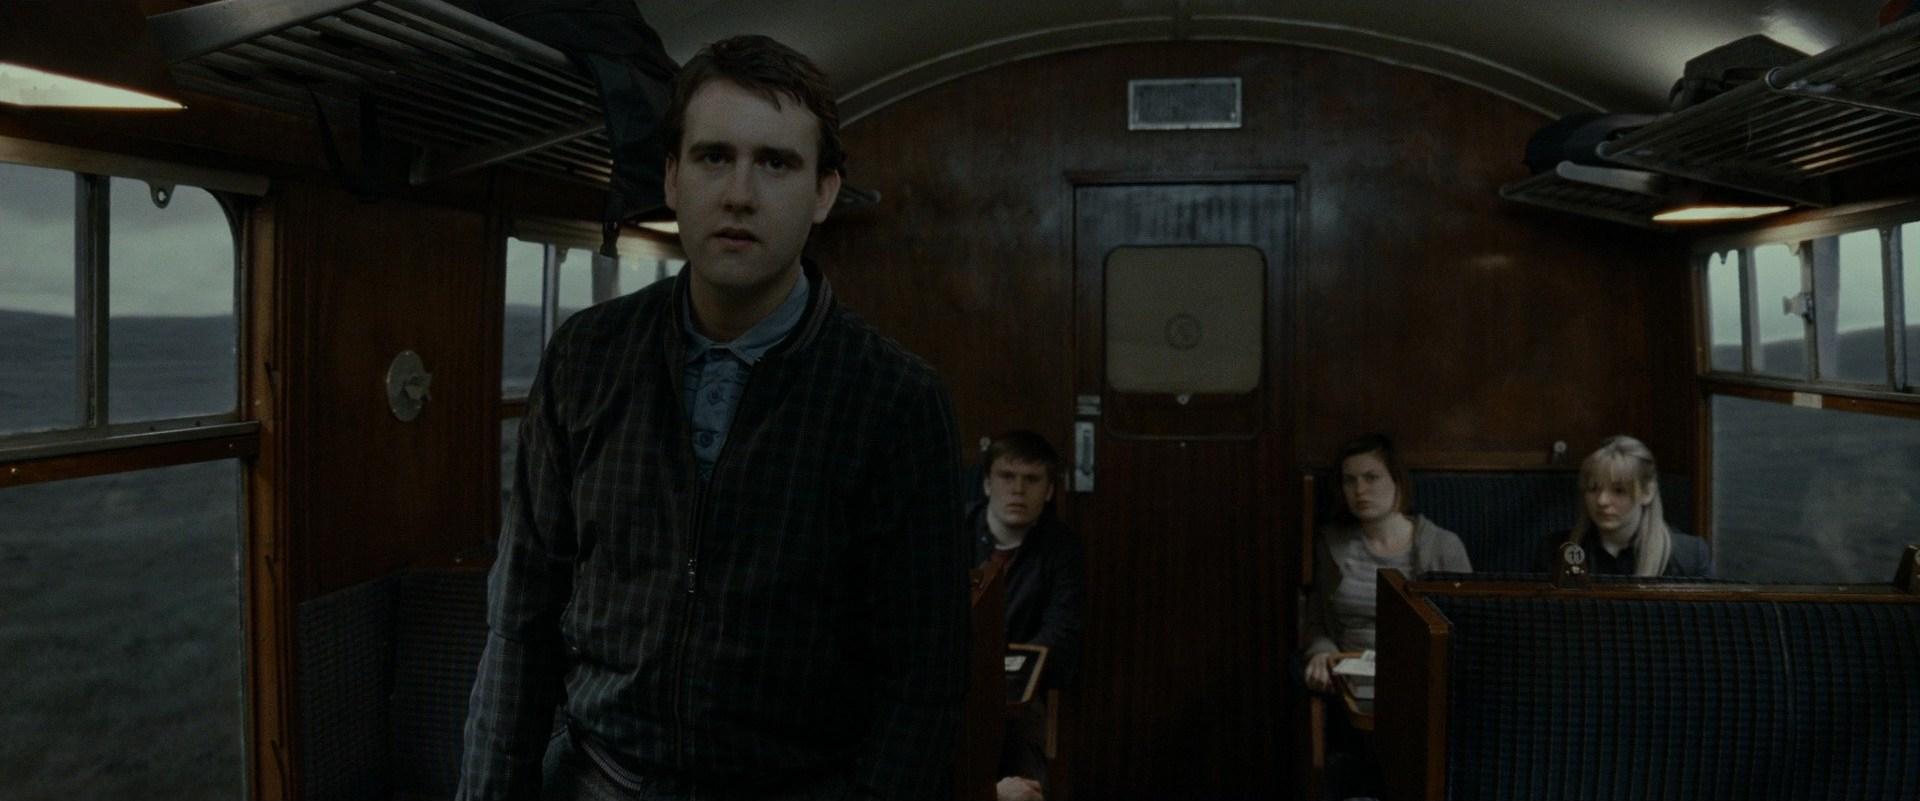 File:Neville on hogwarts express.jpg